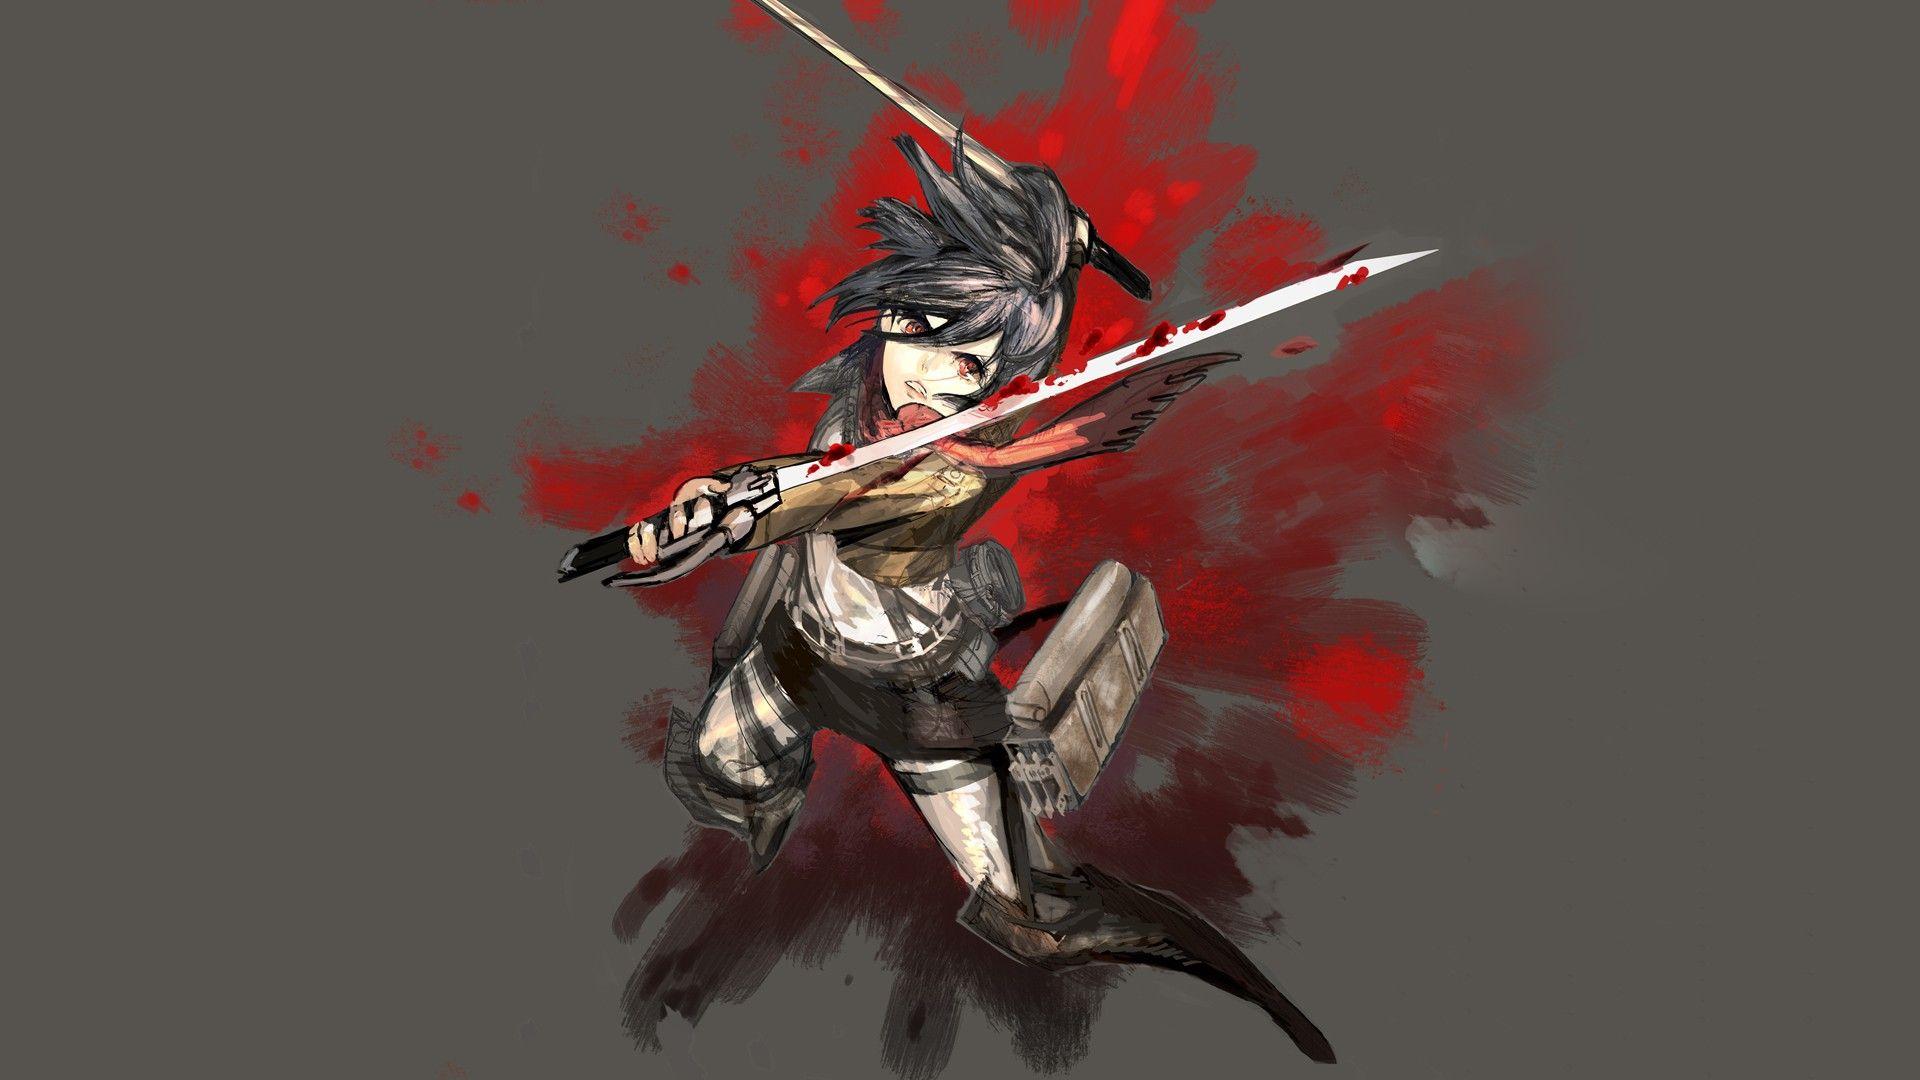 Anime Attack On Titan Wallpaper Attack on titan, Anime